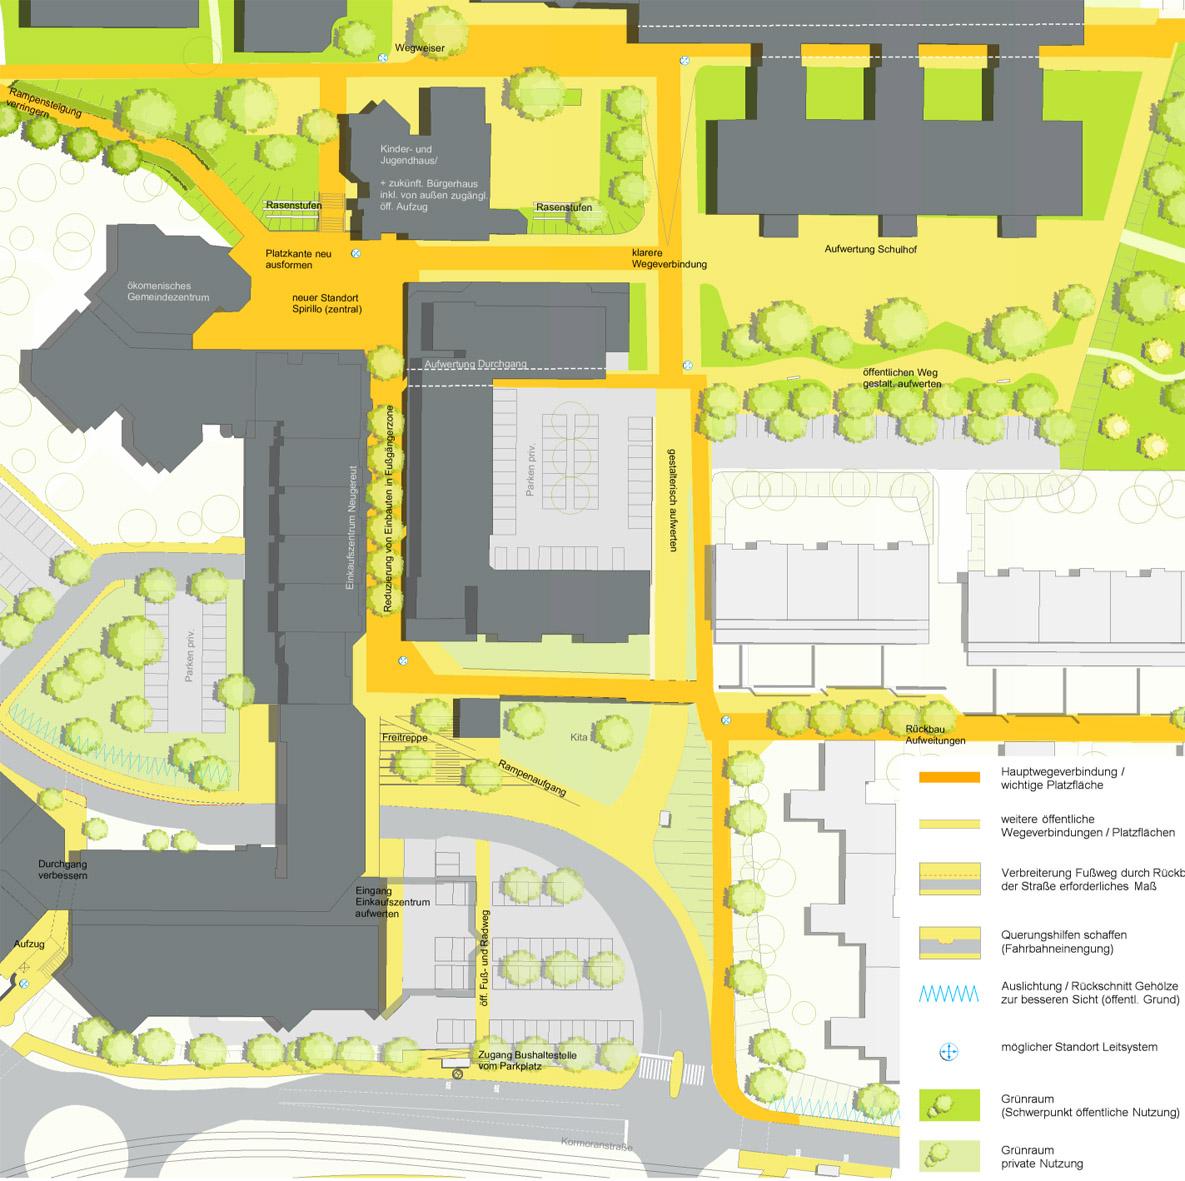 NGR_Entwurf Neue Mitte_plan